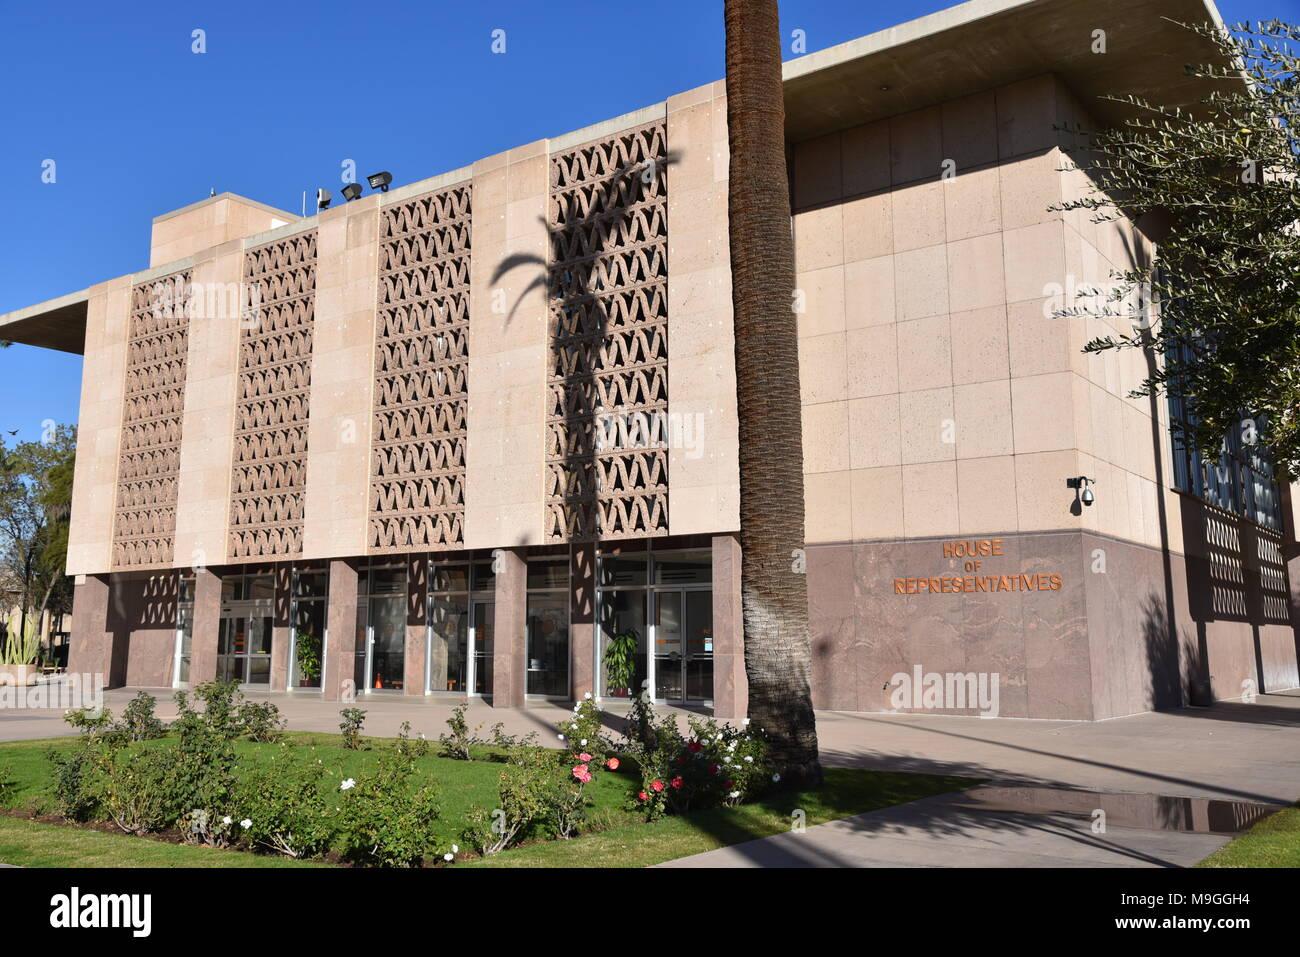 Arizona State Representatives >> Arizona House Of Representatives Arizona State Capitol